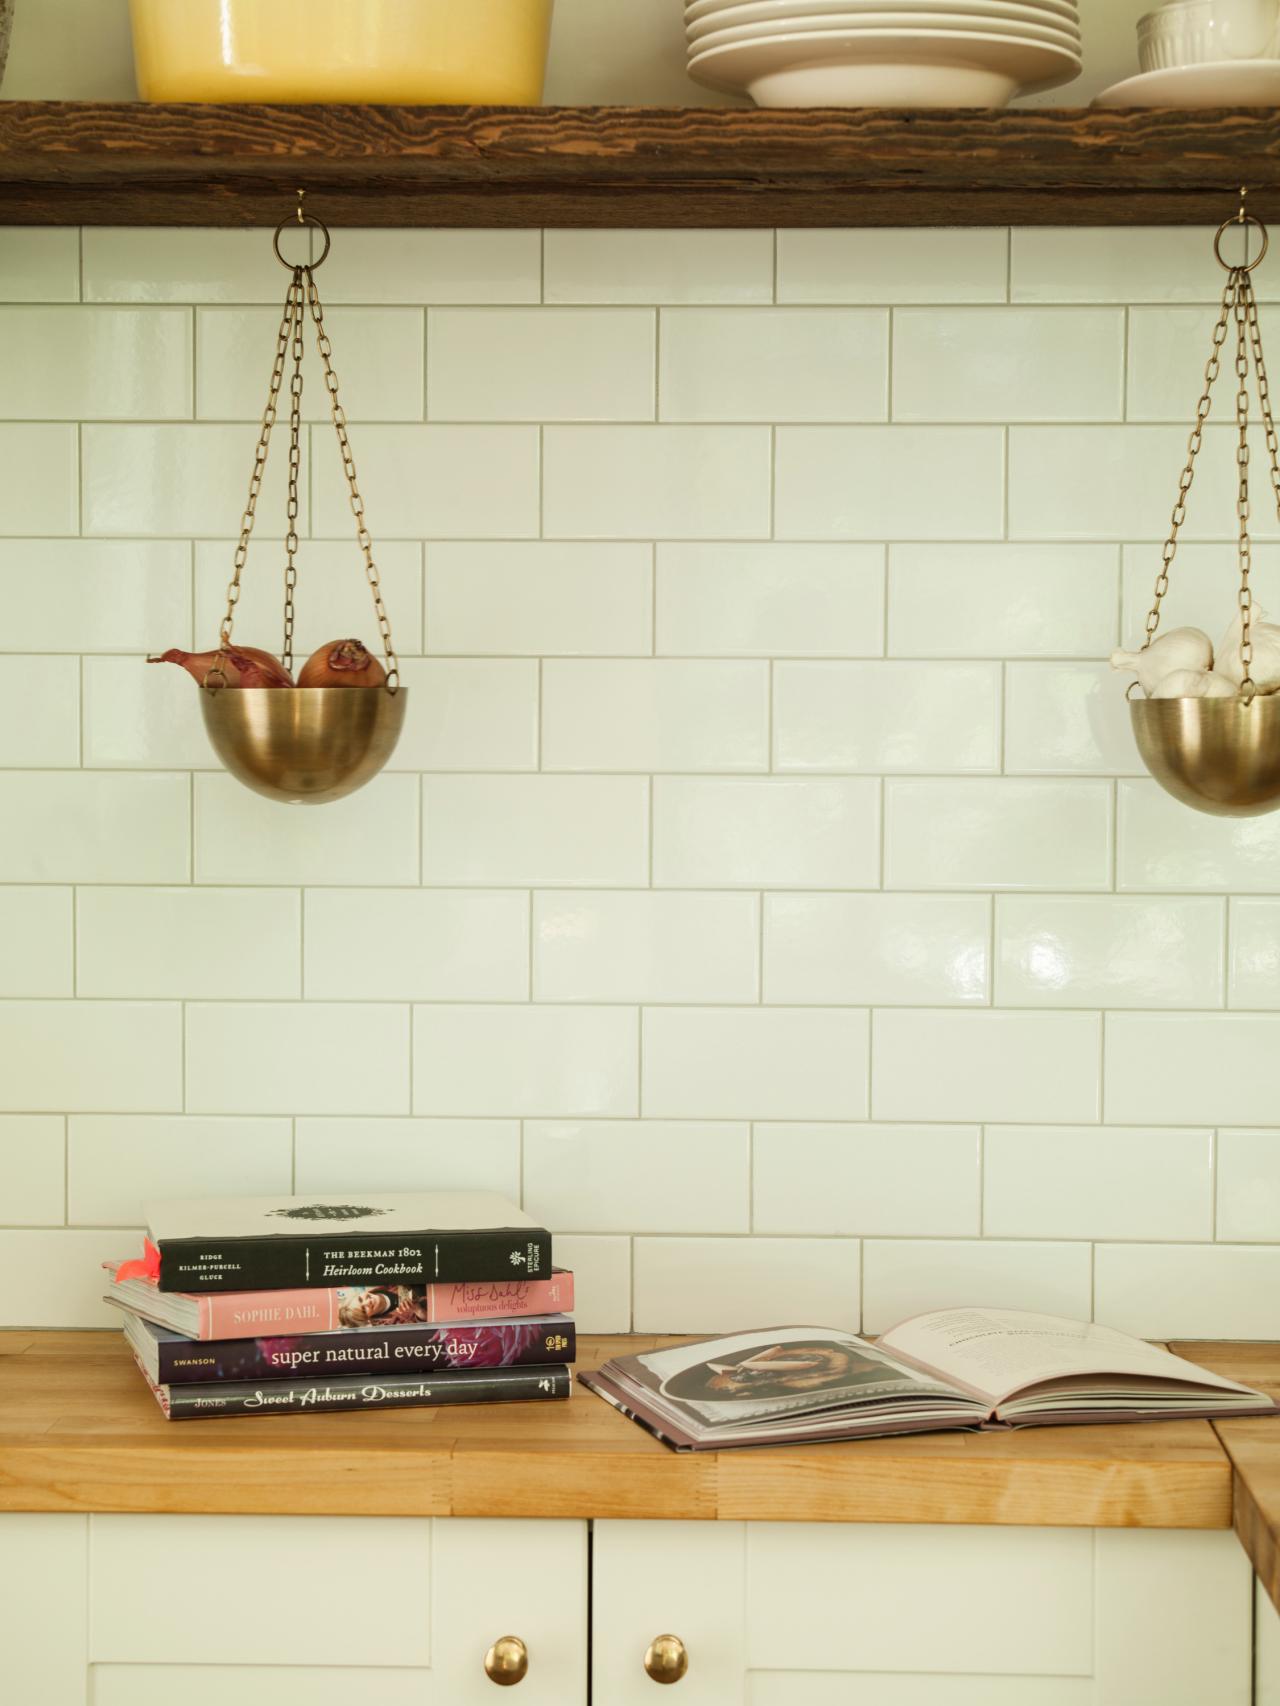 Dated Kitchen Goes Mod Farmhouse | HGTV on old world home decor ideas, old world kitchen backsplash ideas, old world kitchen design ideas,